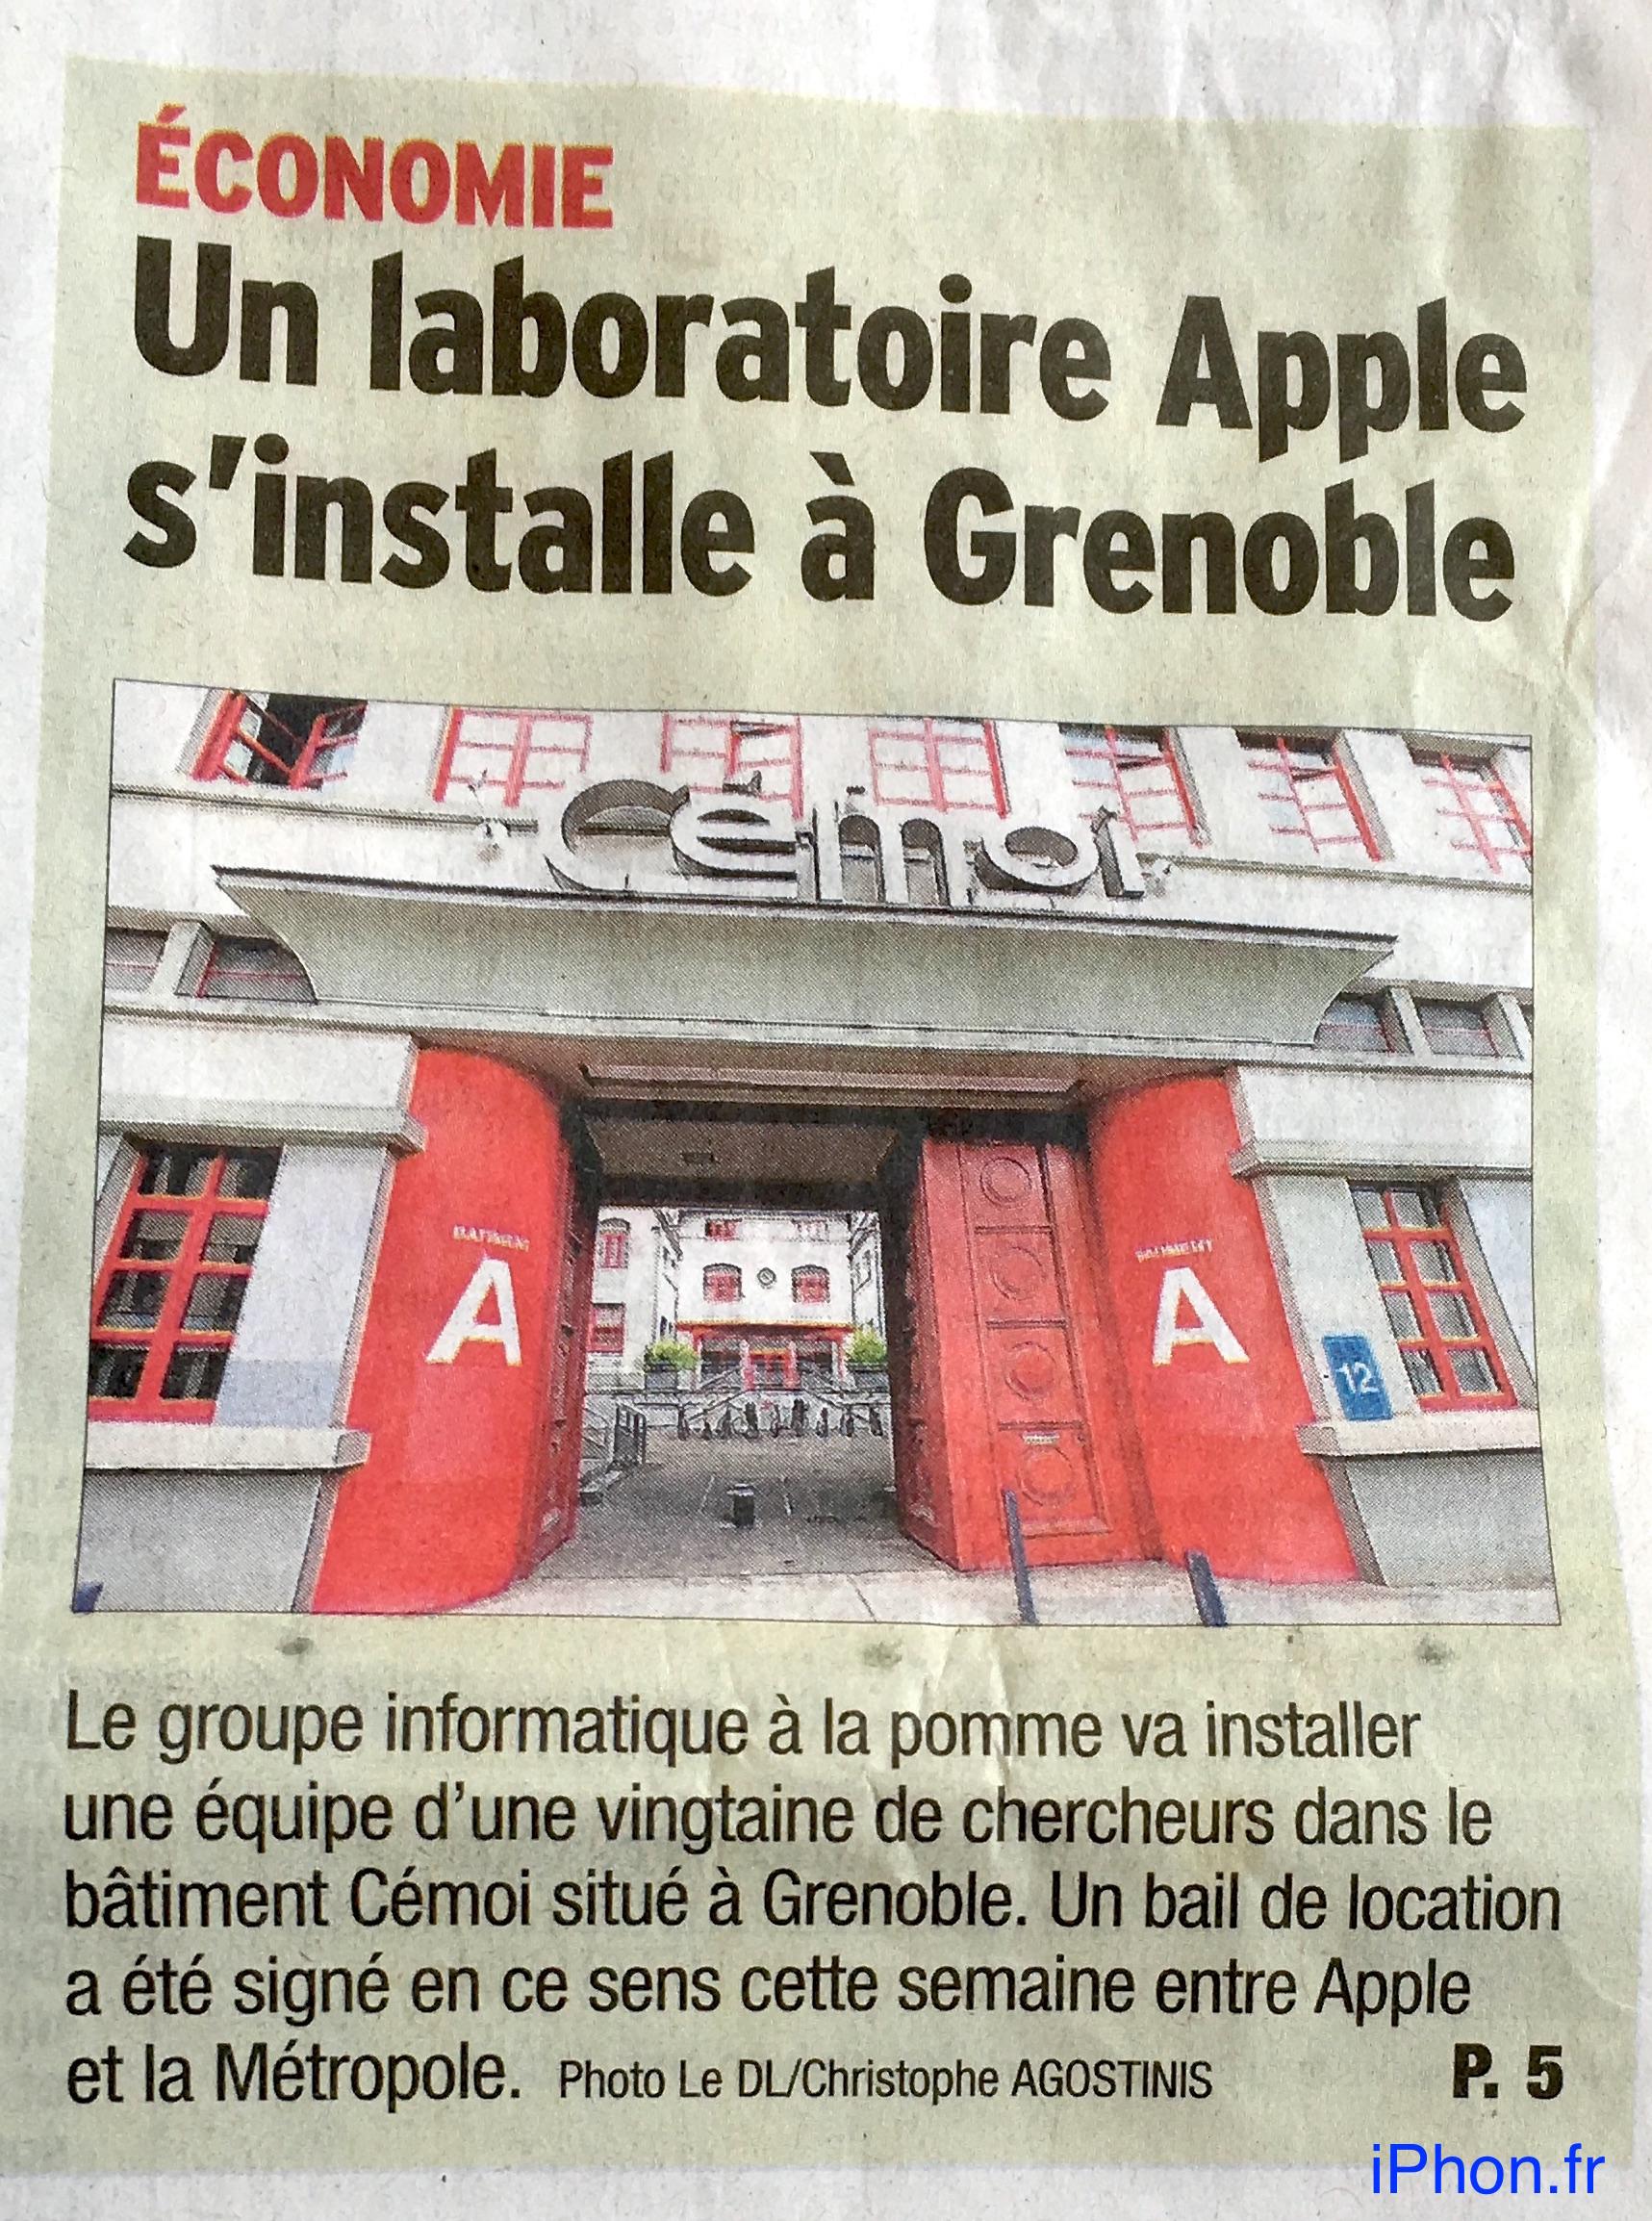 Apple imaging lab France Grenlobe newspaper report 001